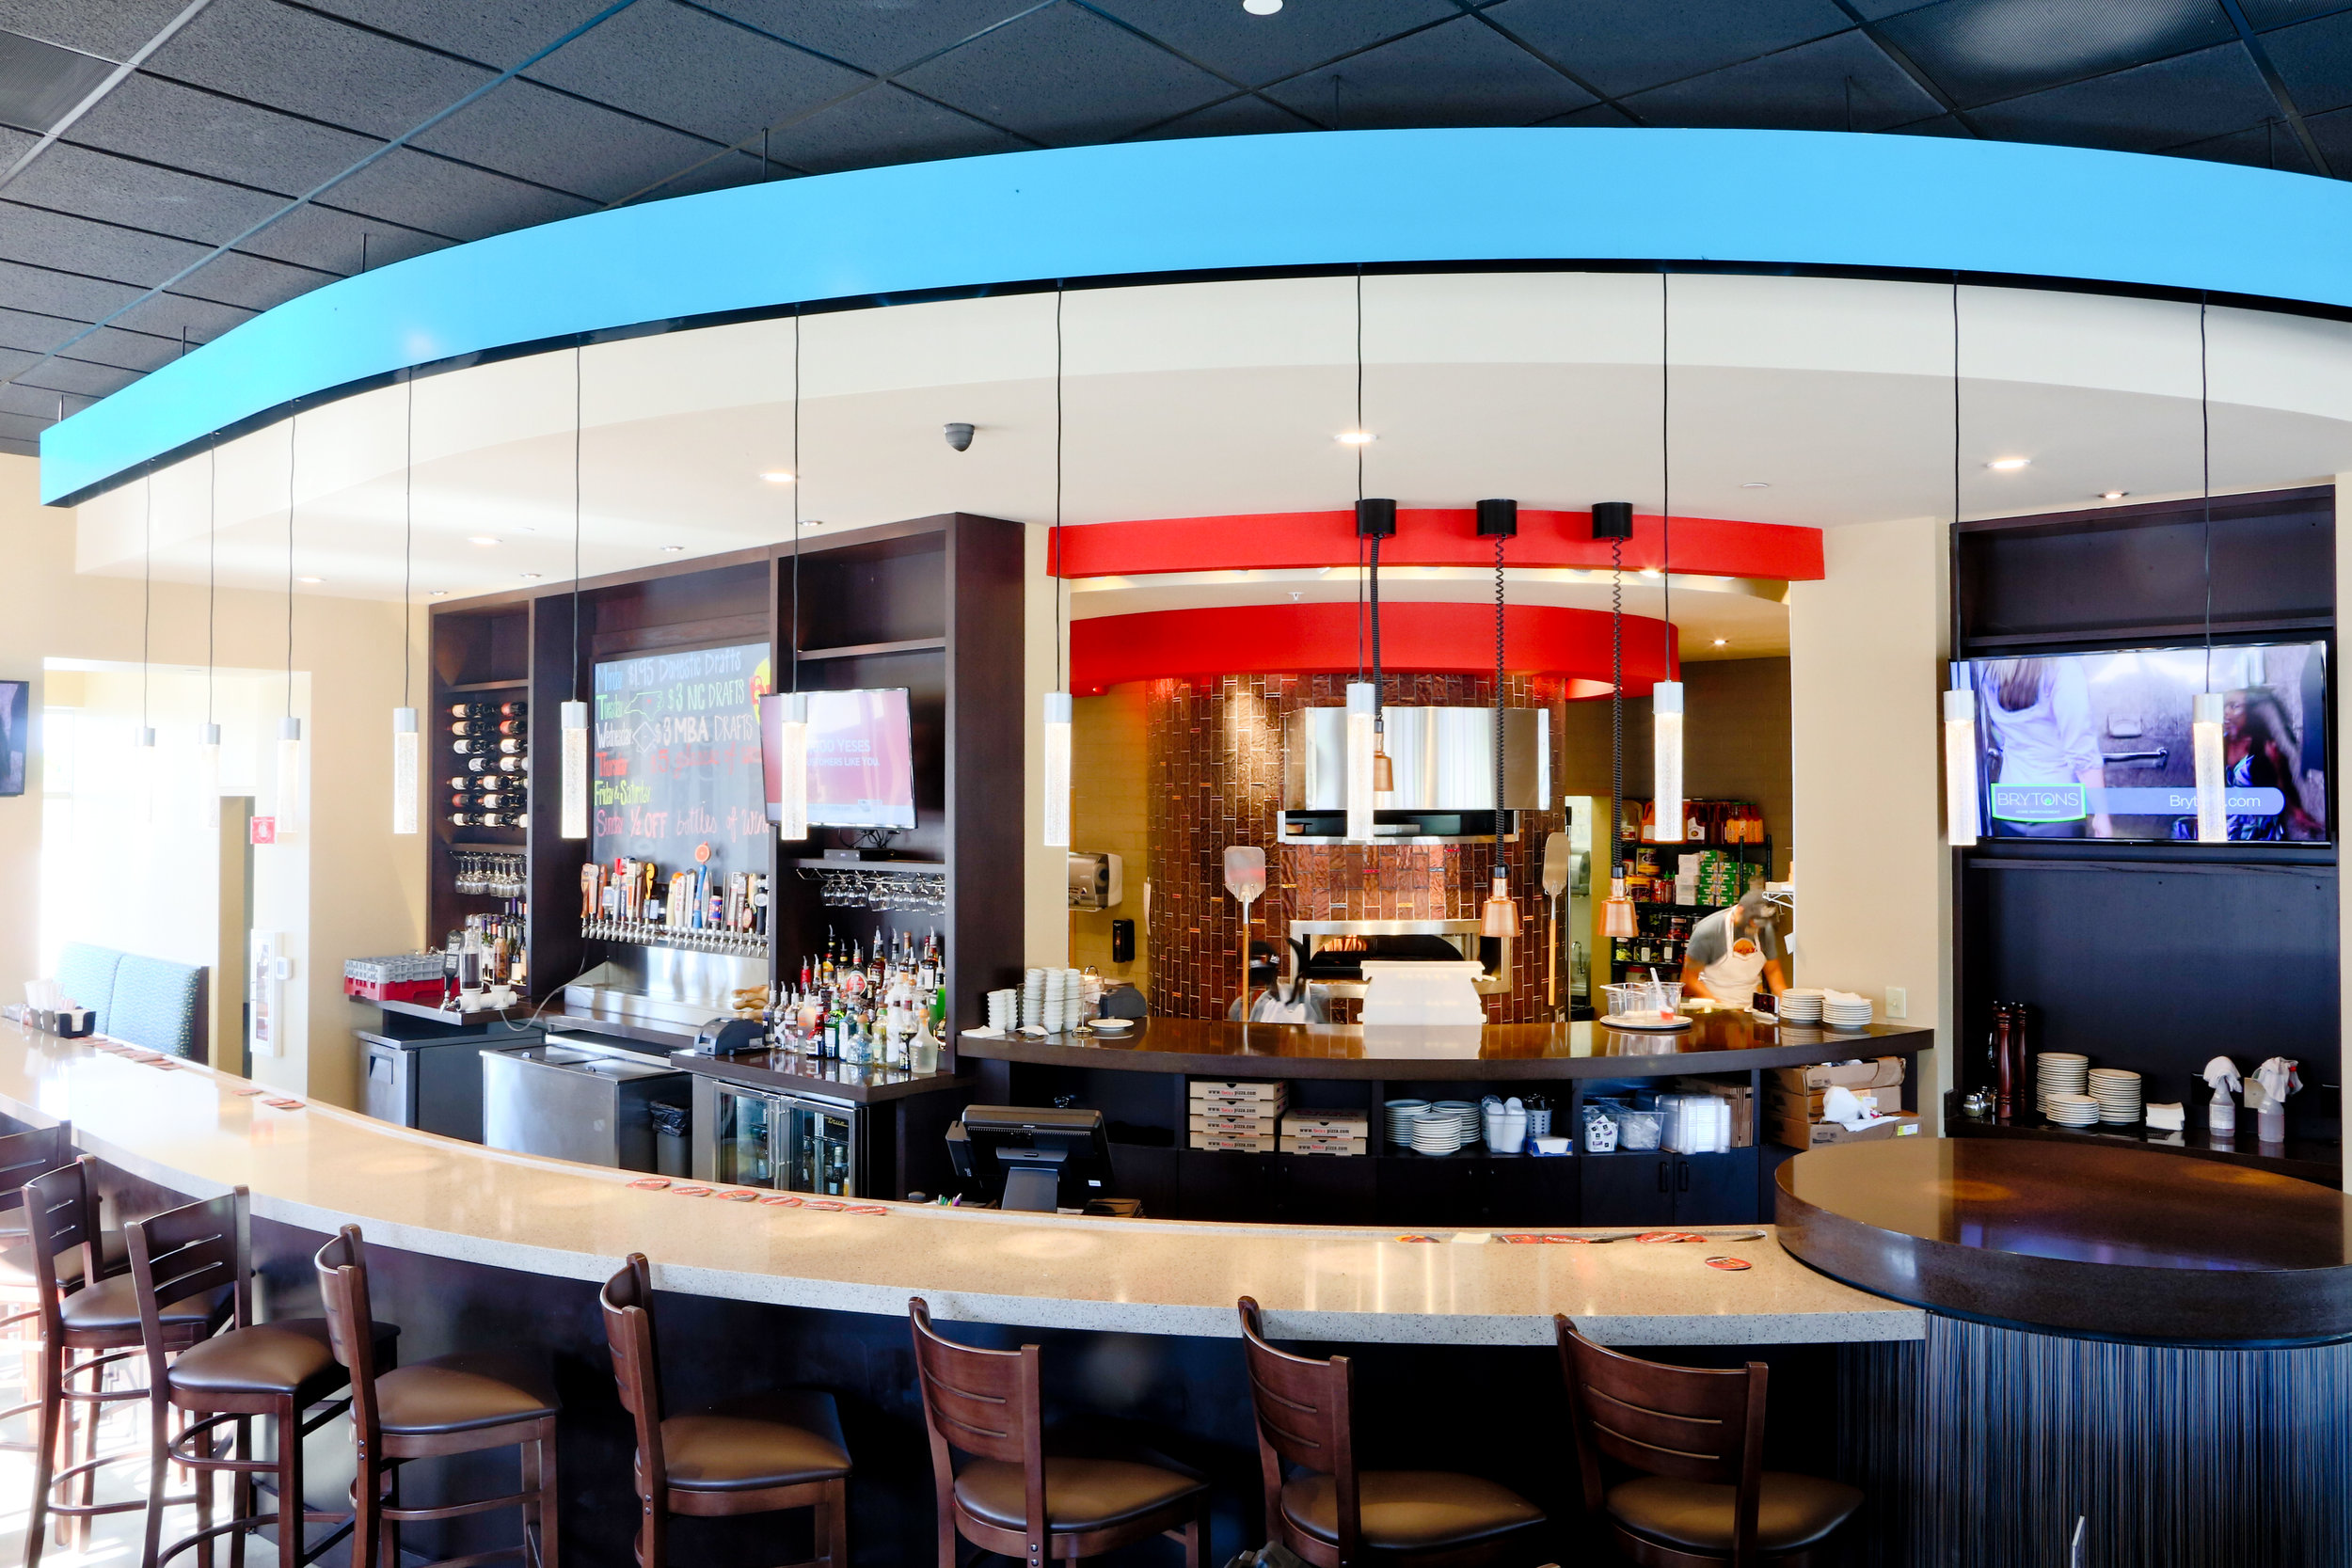 ADW-Restaurant-Brixx-Wood-Fired-Pizza-Cary-NC-Bar.JPG